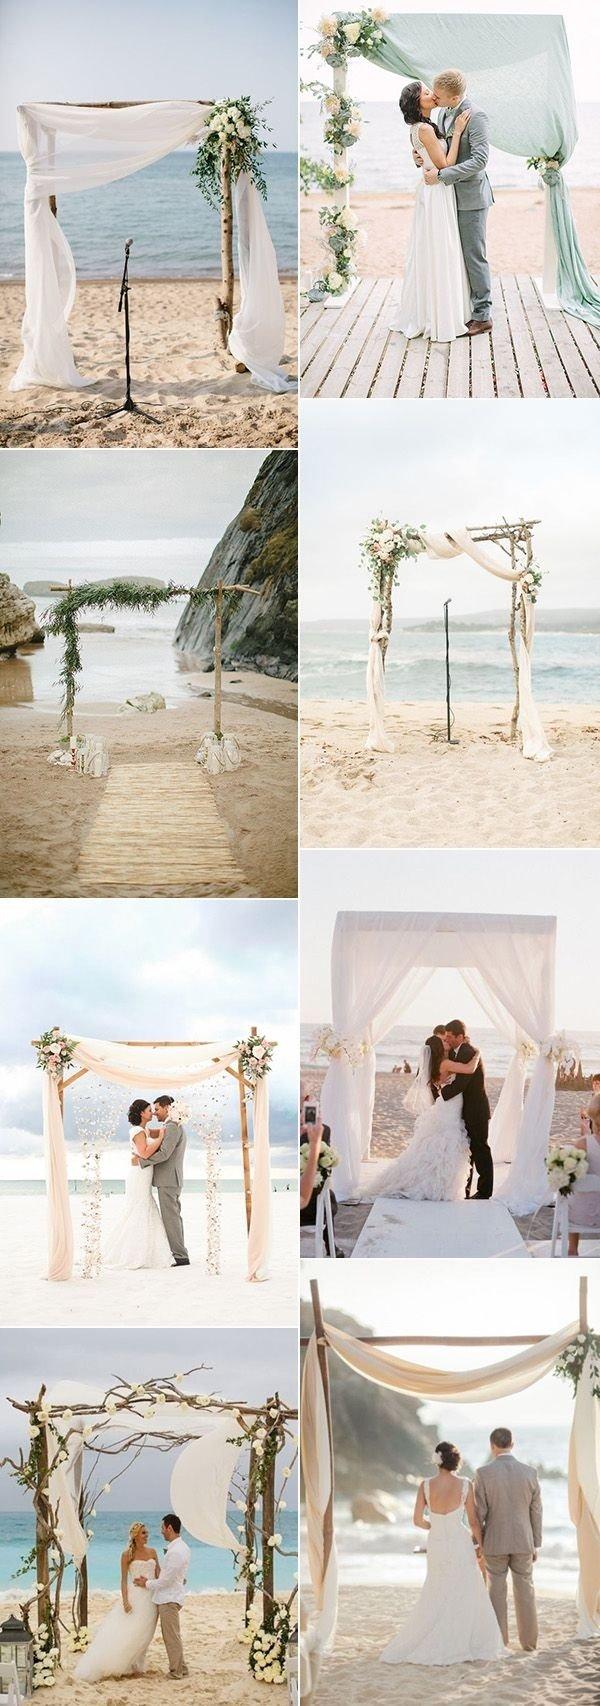 10 Wonderful Ideas For A Beach Wedding 80 best beach weddings images on pinterest beach weddings wedding 2021